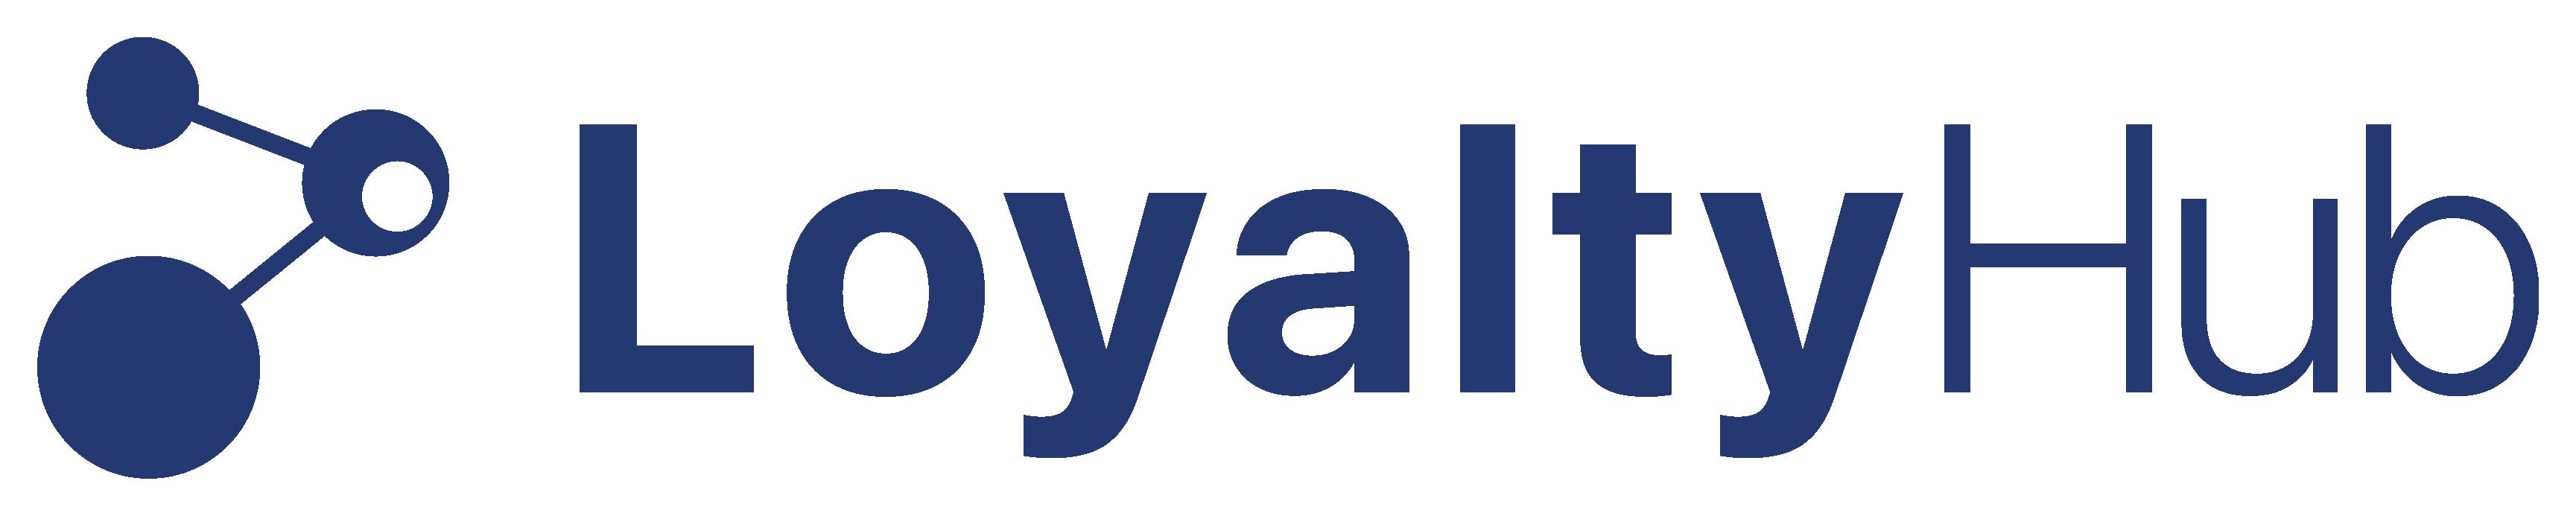 logo-loyaltyhub